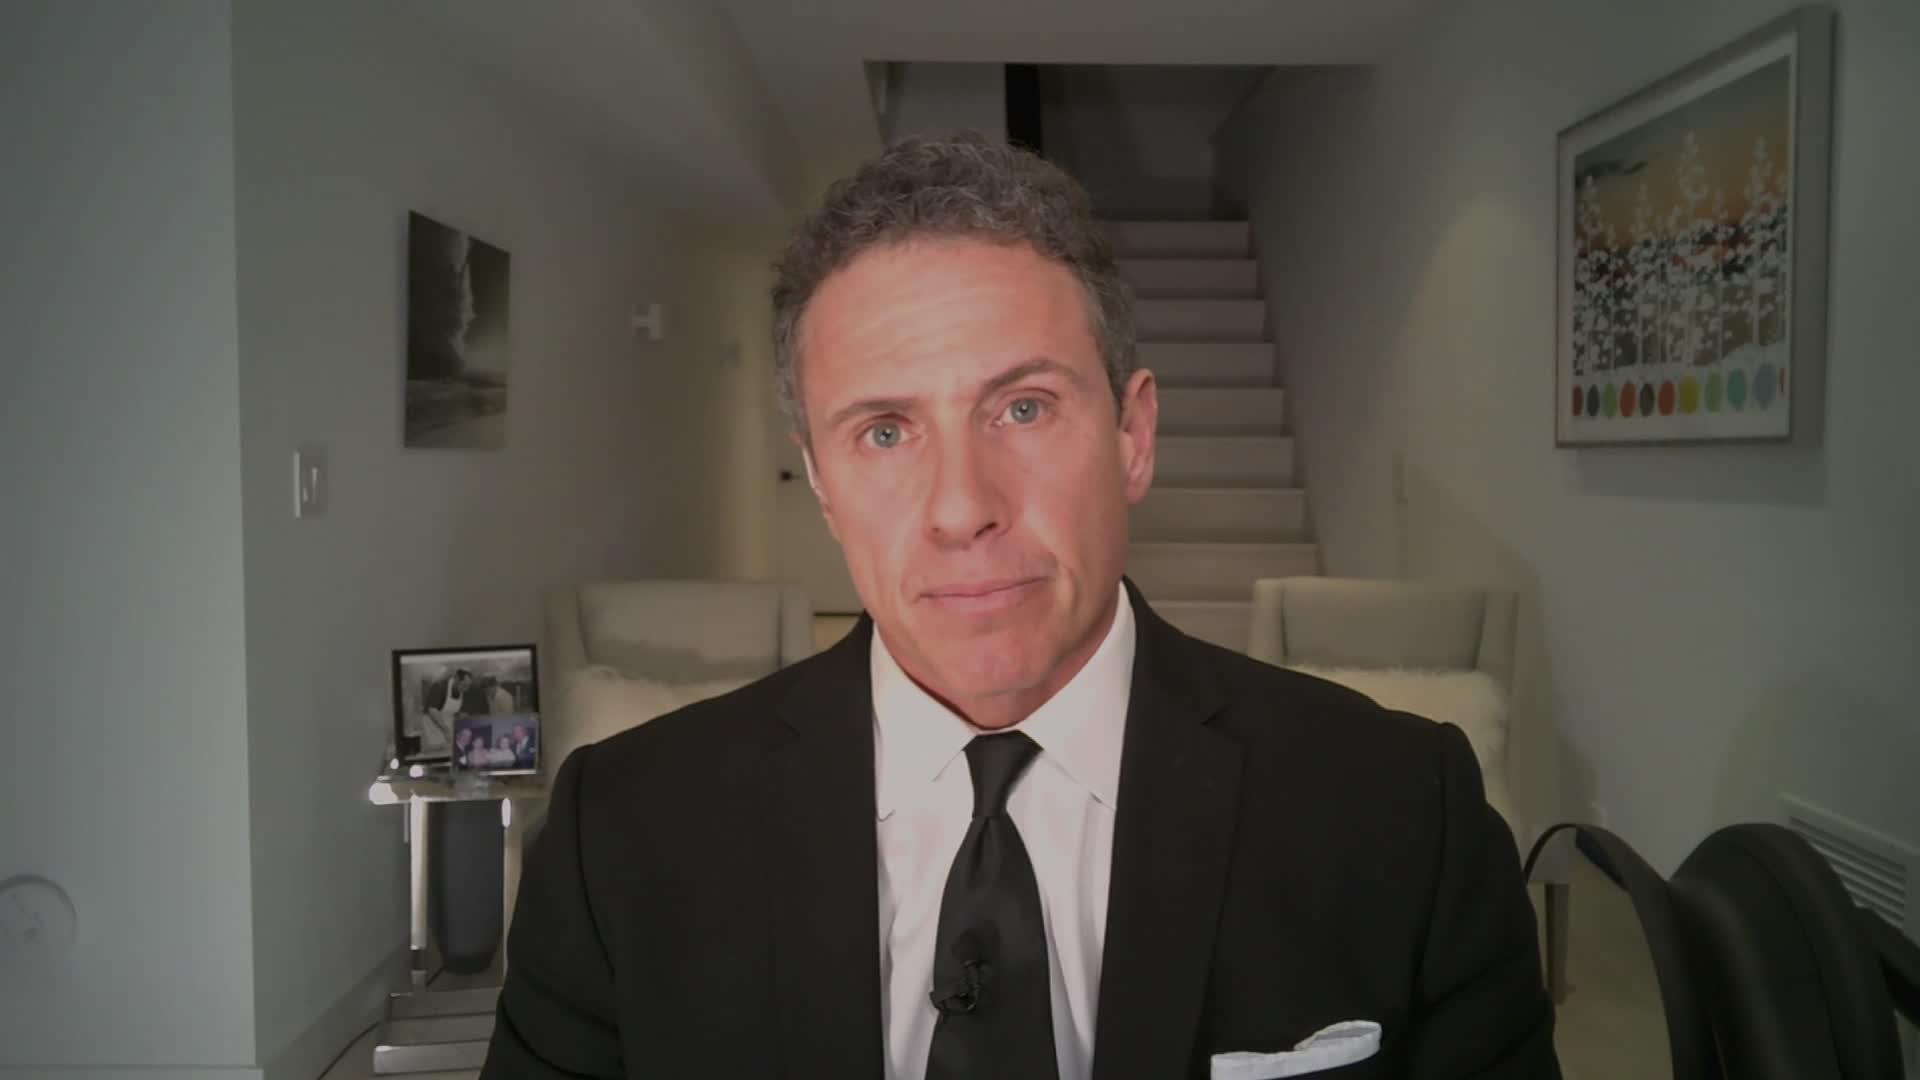 CNN anchor Chris Cuomo was diagnosed with the coronavirus. (CNN)